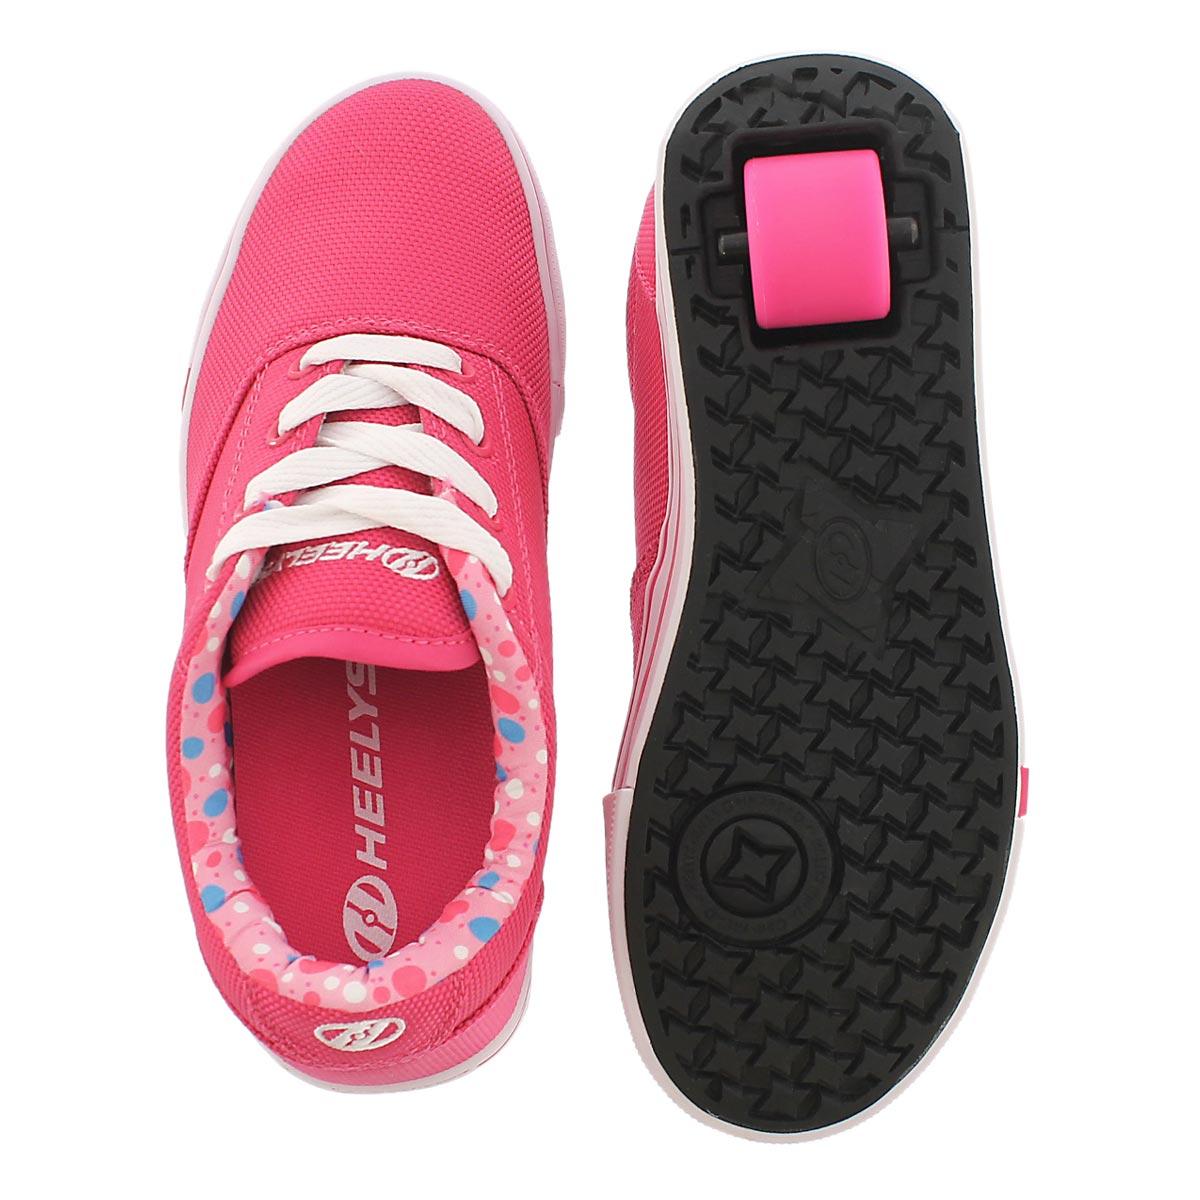 Grls Launch fuchsia lace up sneaker